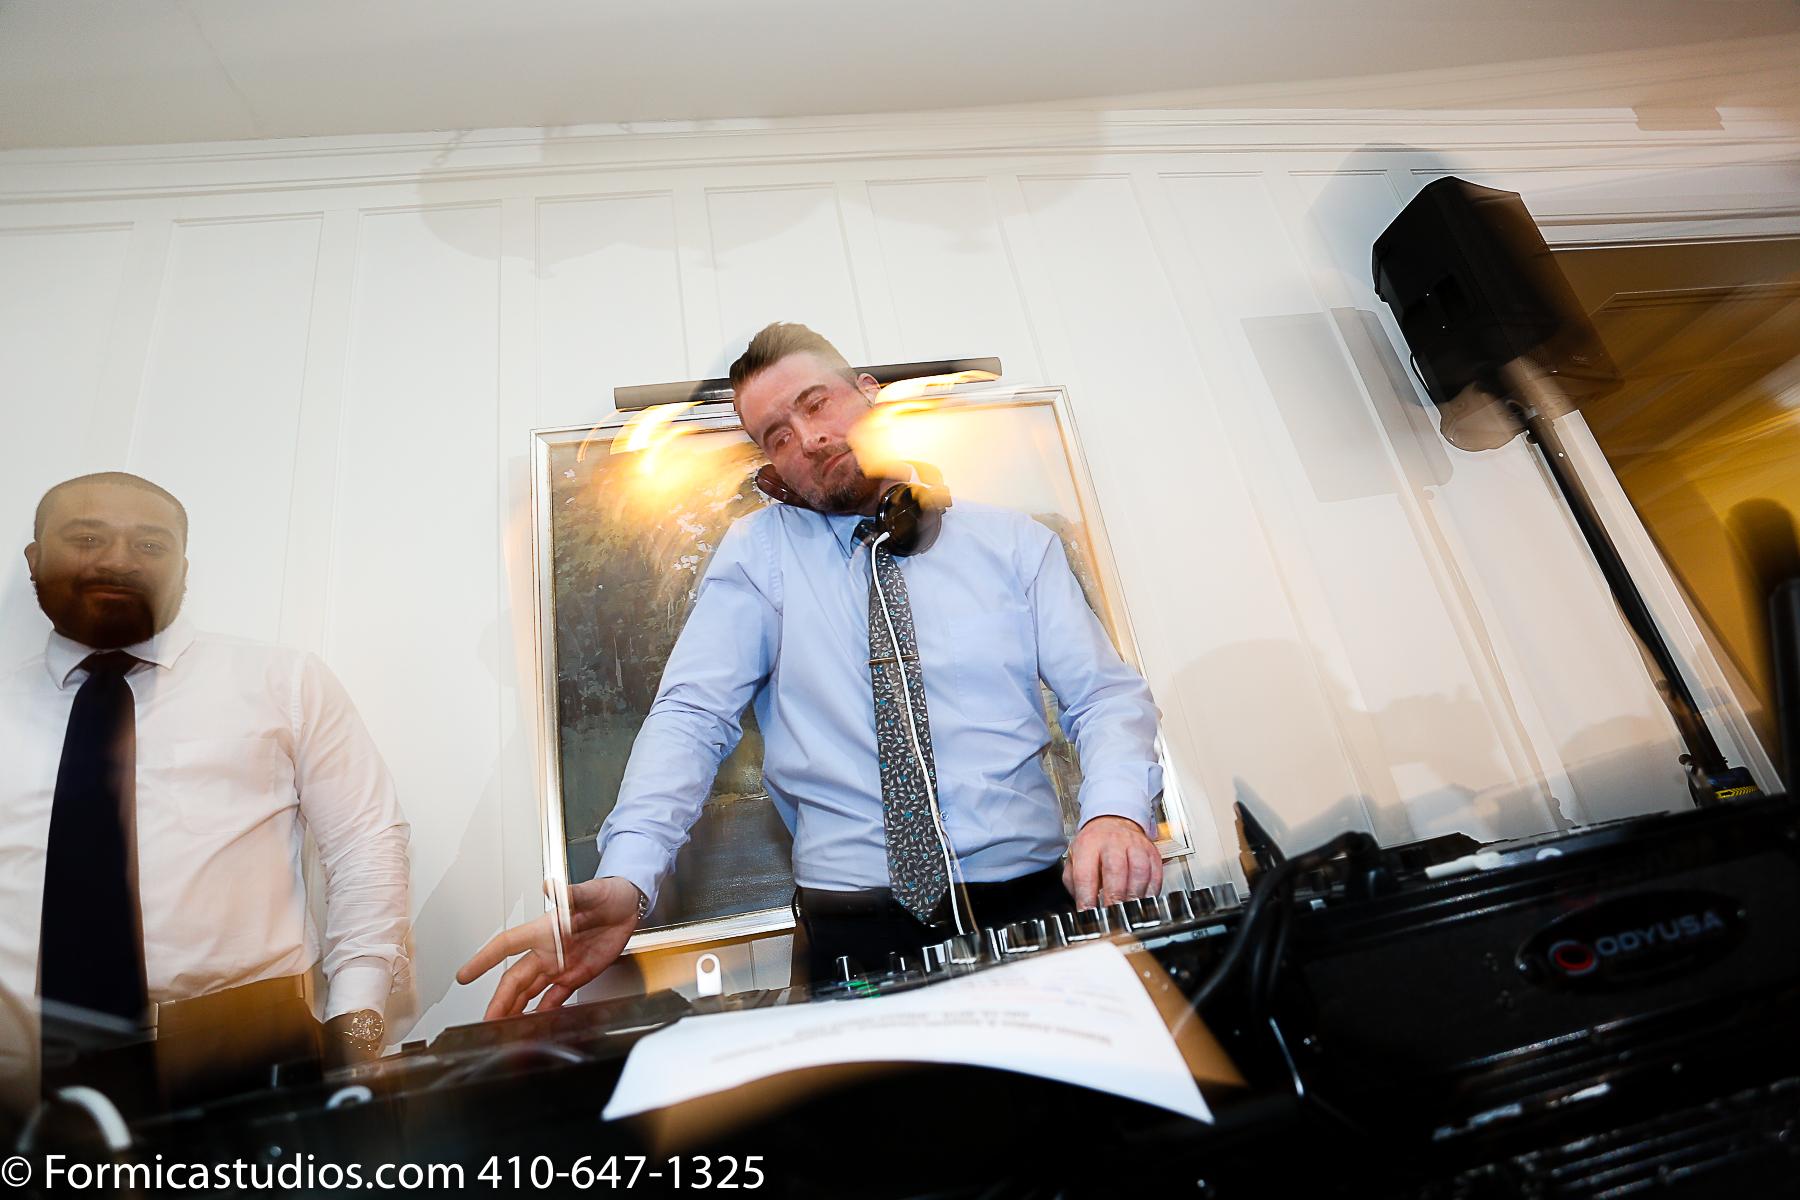 dj spinning music at wedding